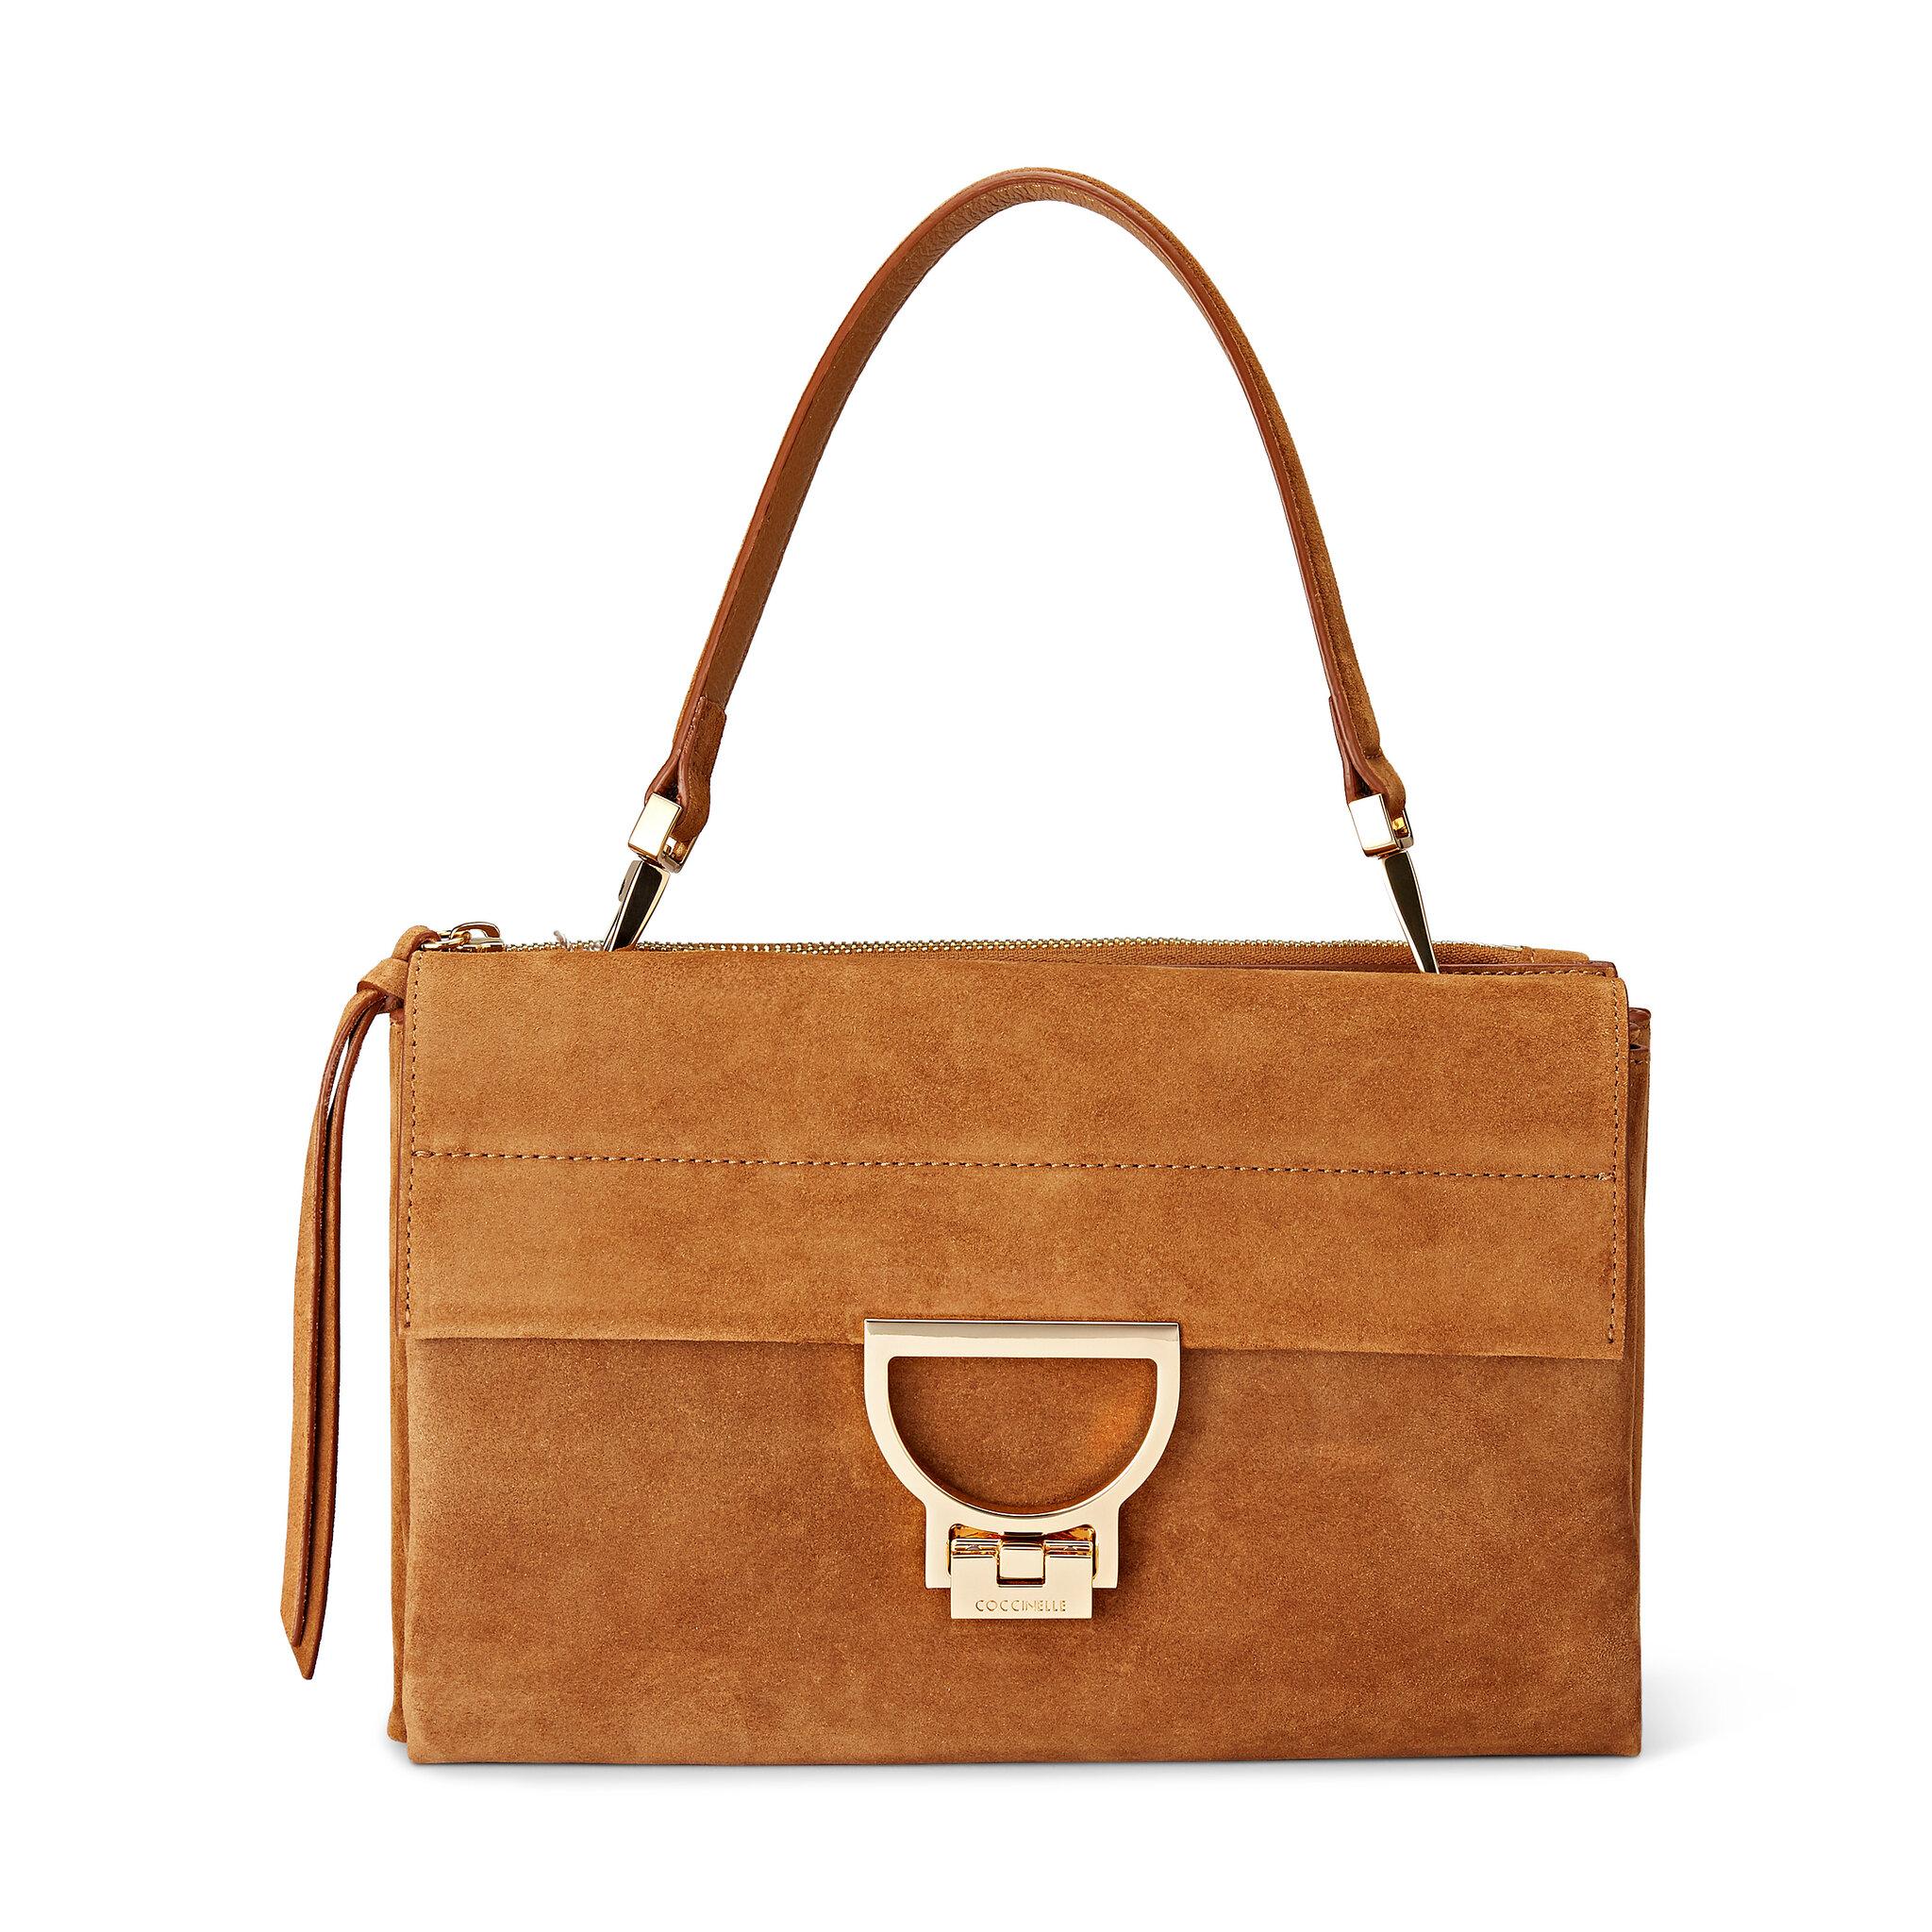 Arlettis Single Strap Bag, brown